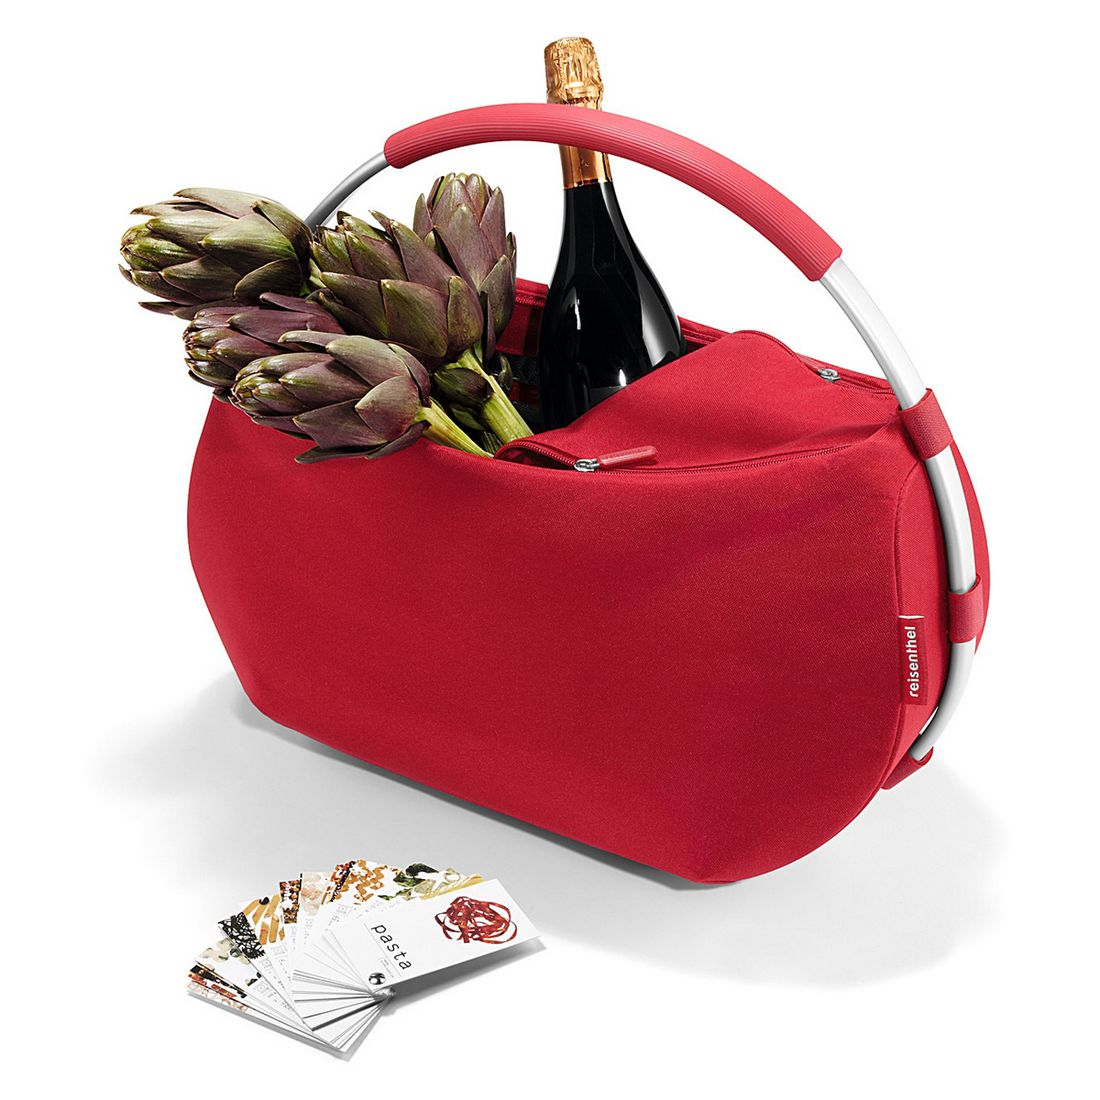 MOONBAG rot – reißfestes Polyestergewebe, Aluminium rot, Reisenthel Accessoires günstig bestellen